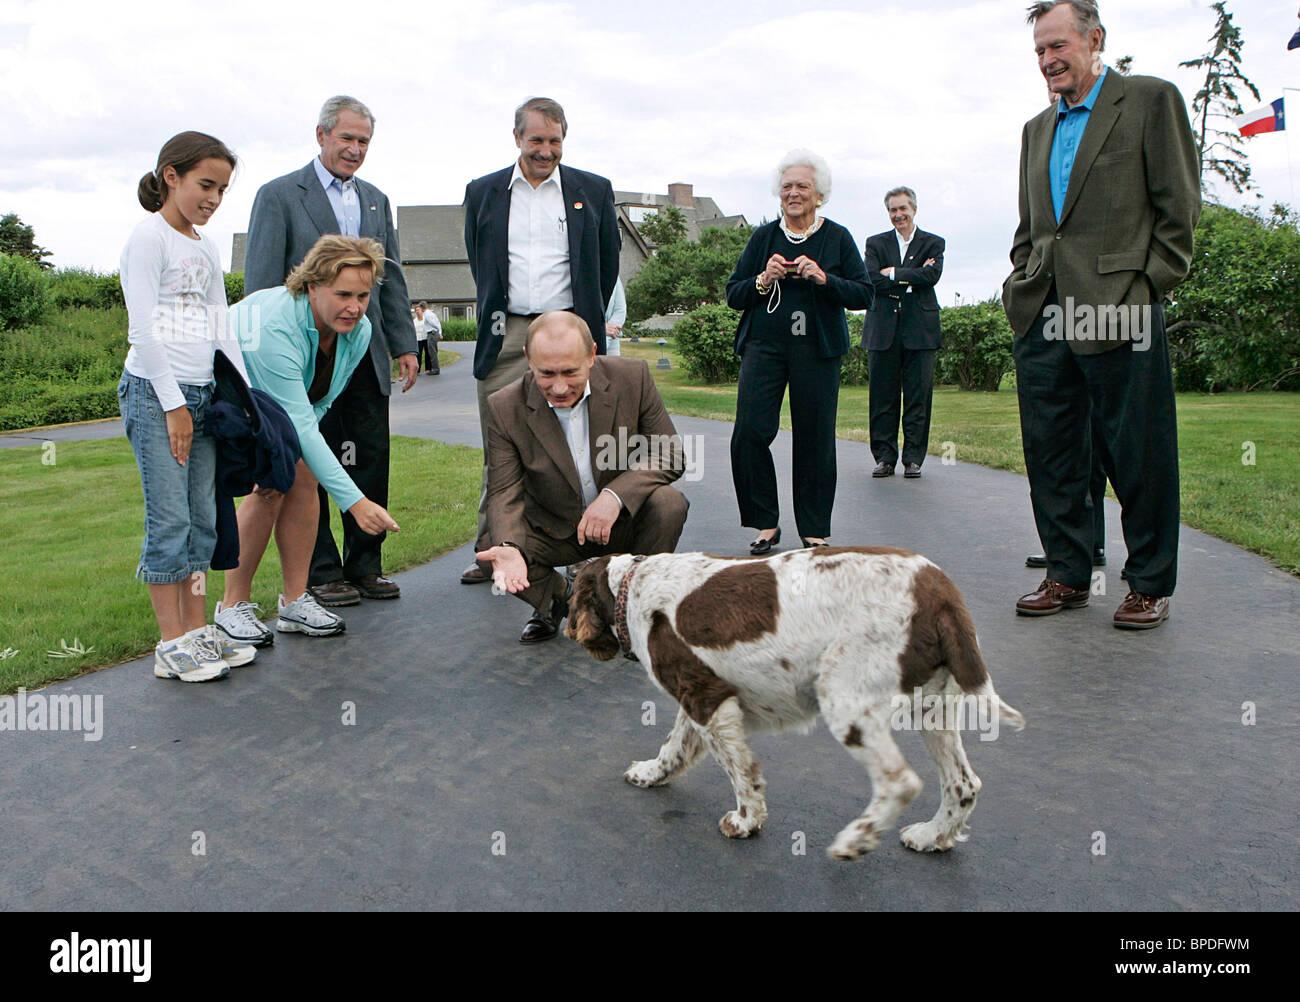 Russian President Vladimir Putin on a visit to USA - Stock Image